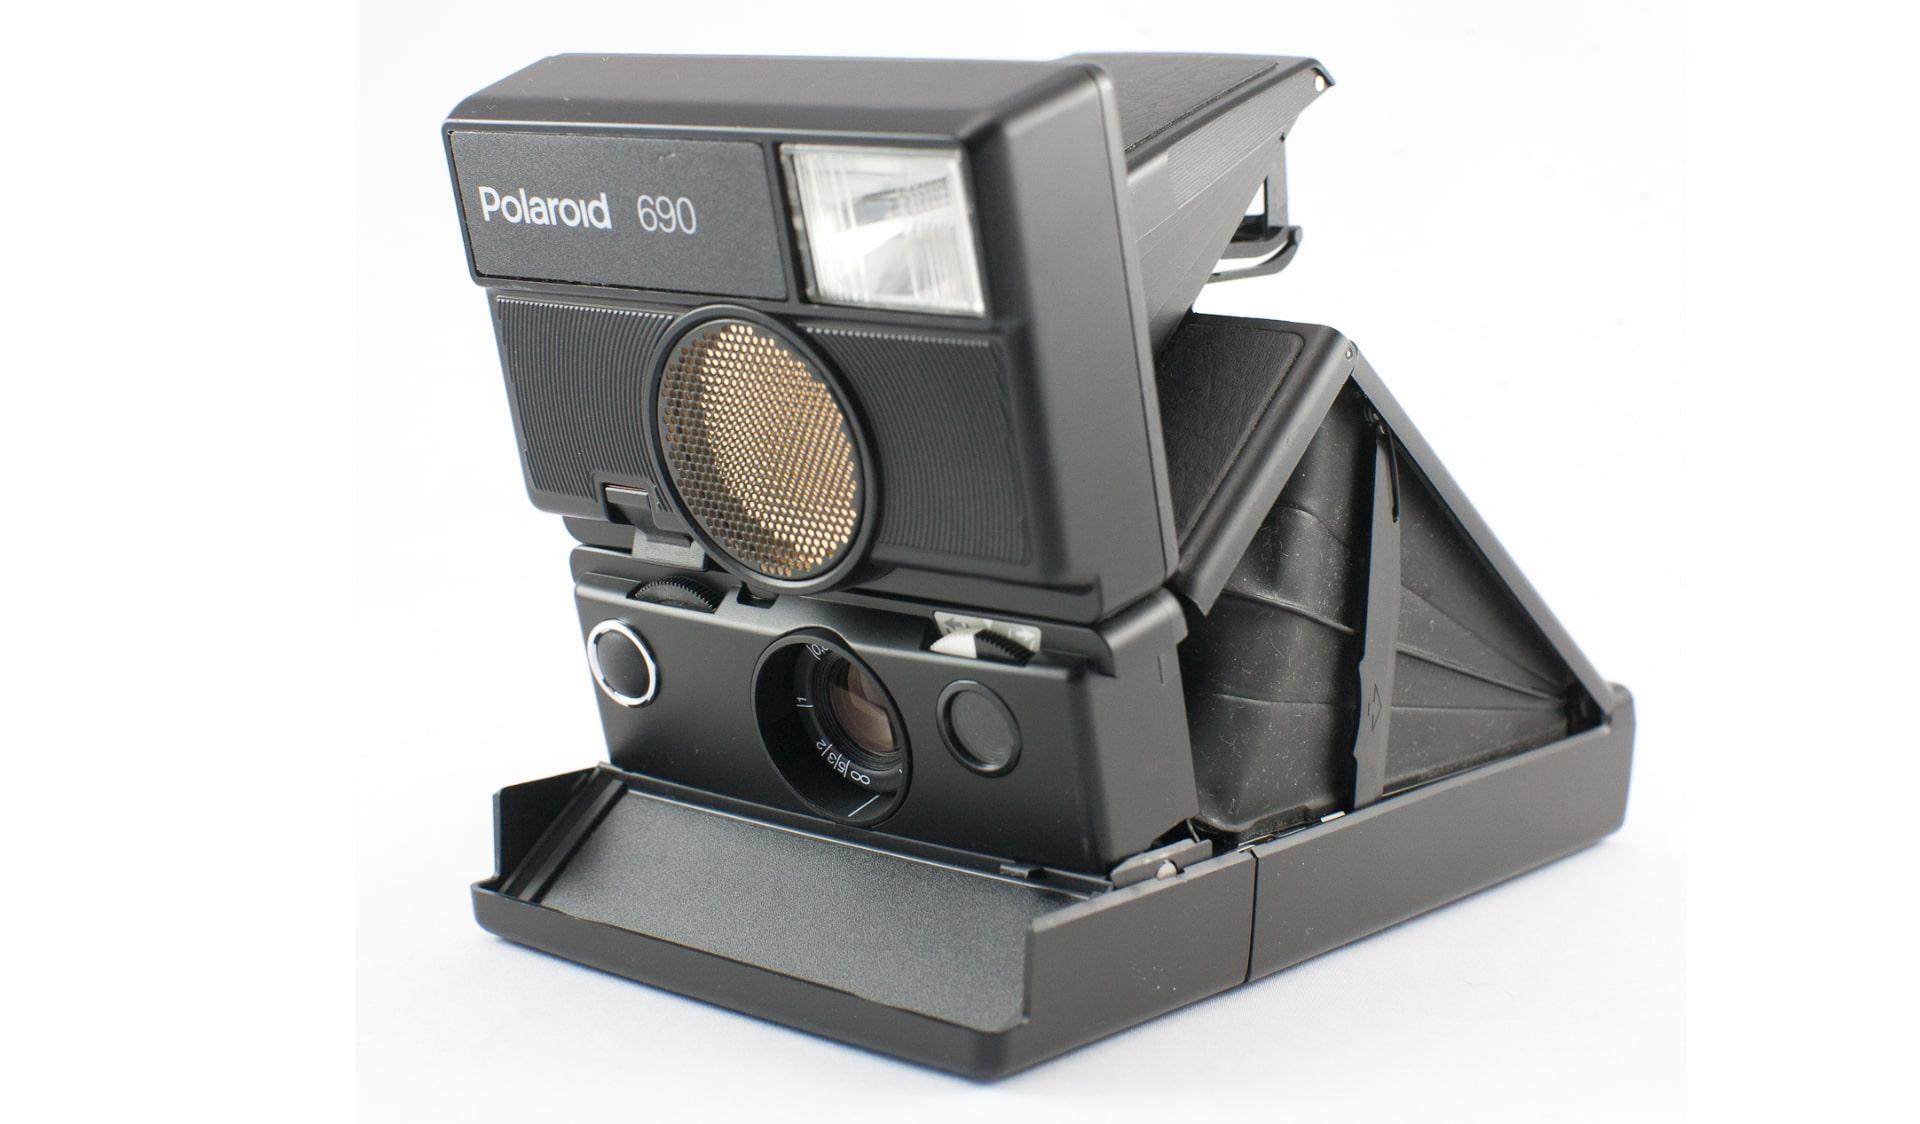 Фотоапарат Polaroid SLR690